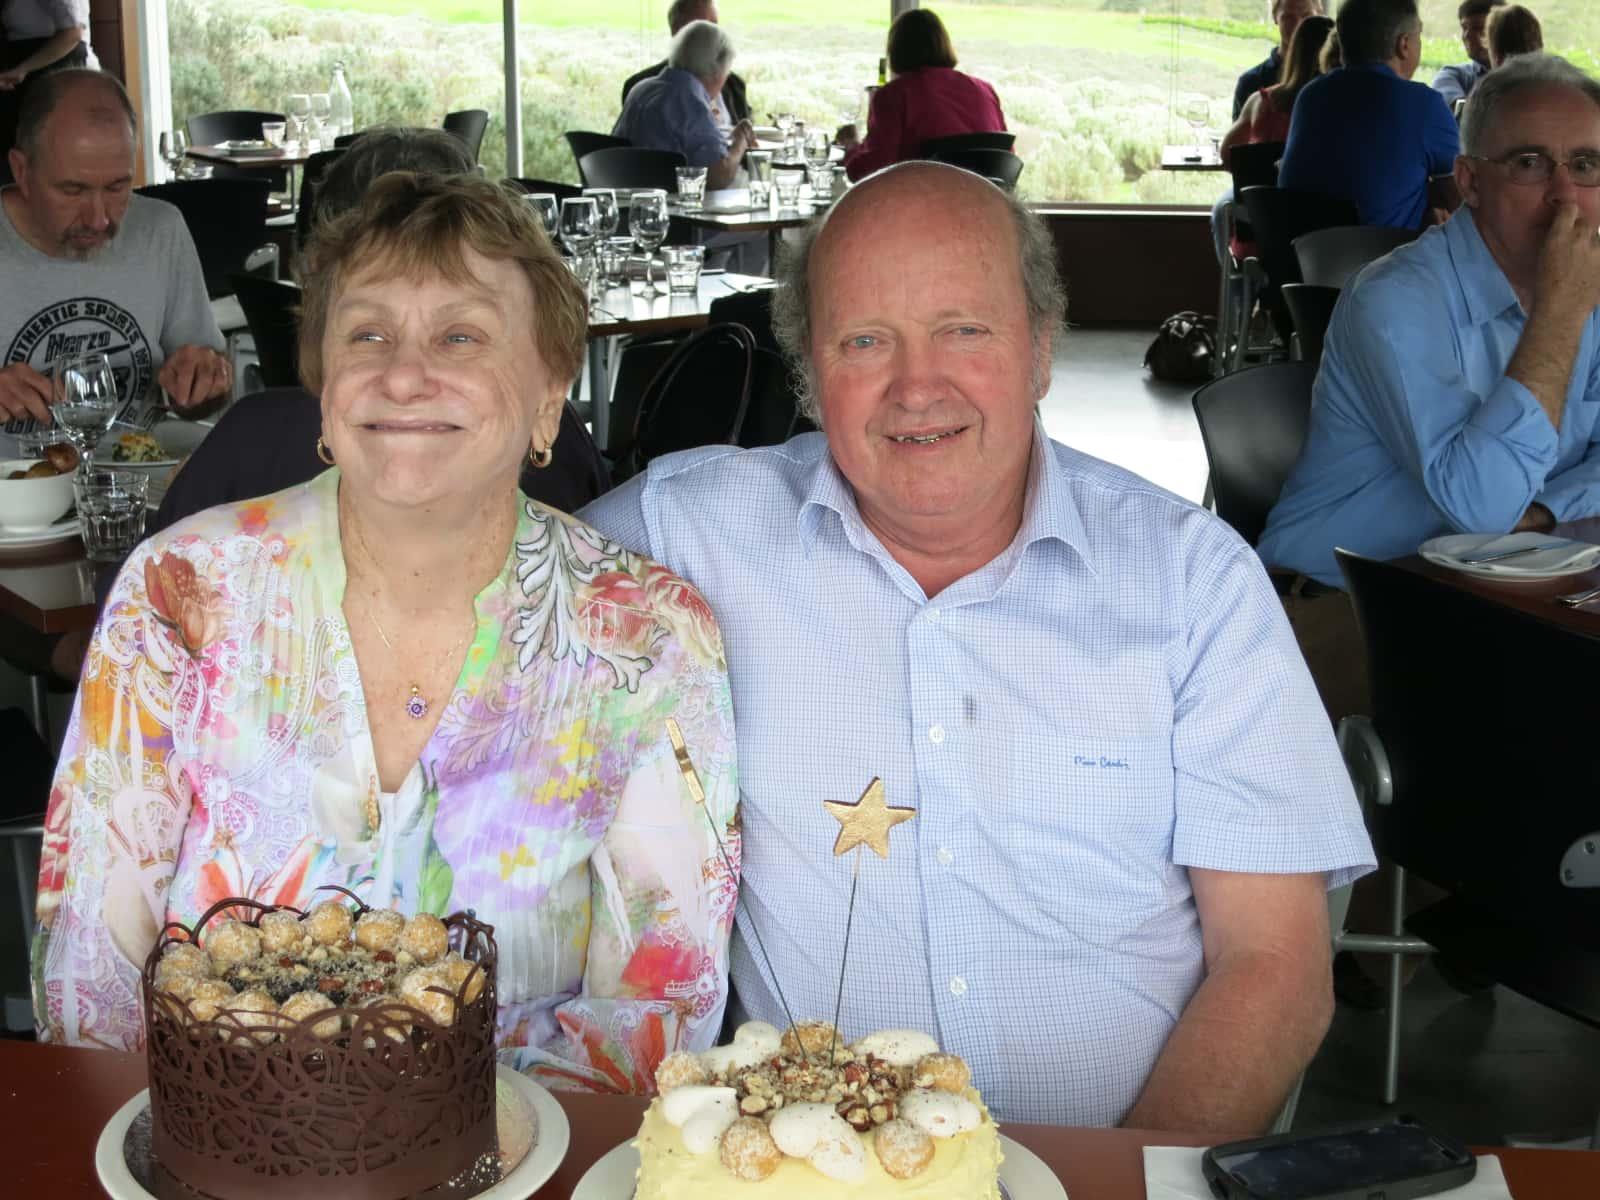 Marcia & John robert from Bellara, Queensland, Australia